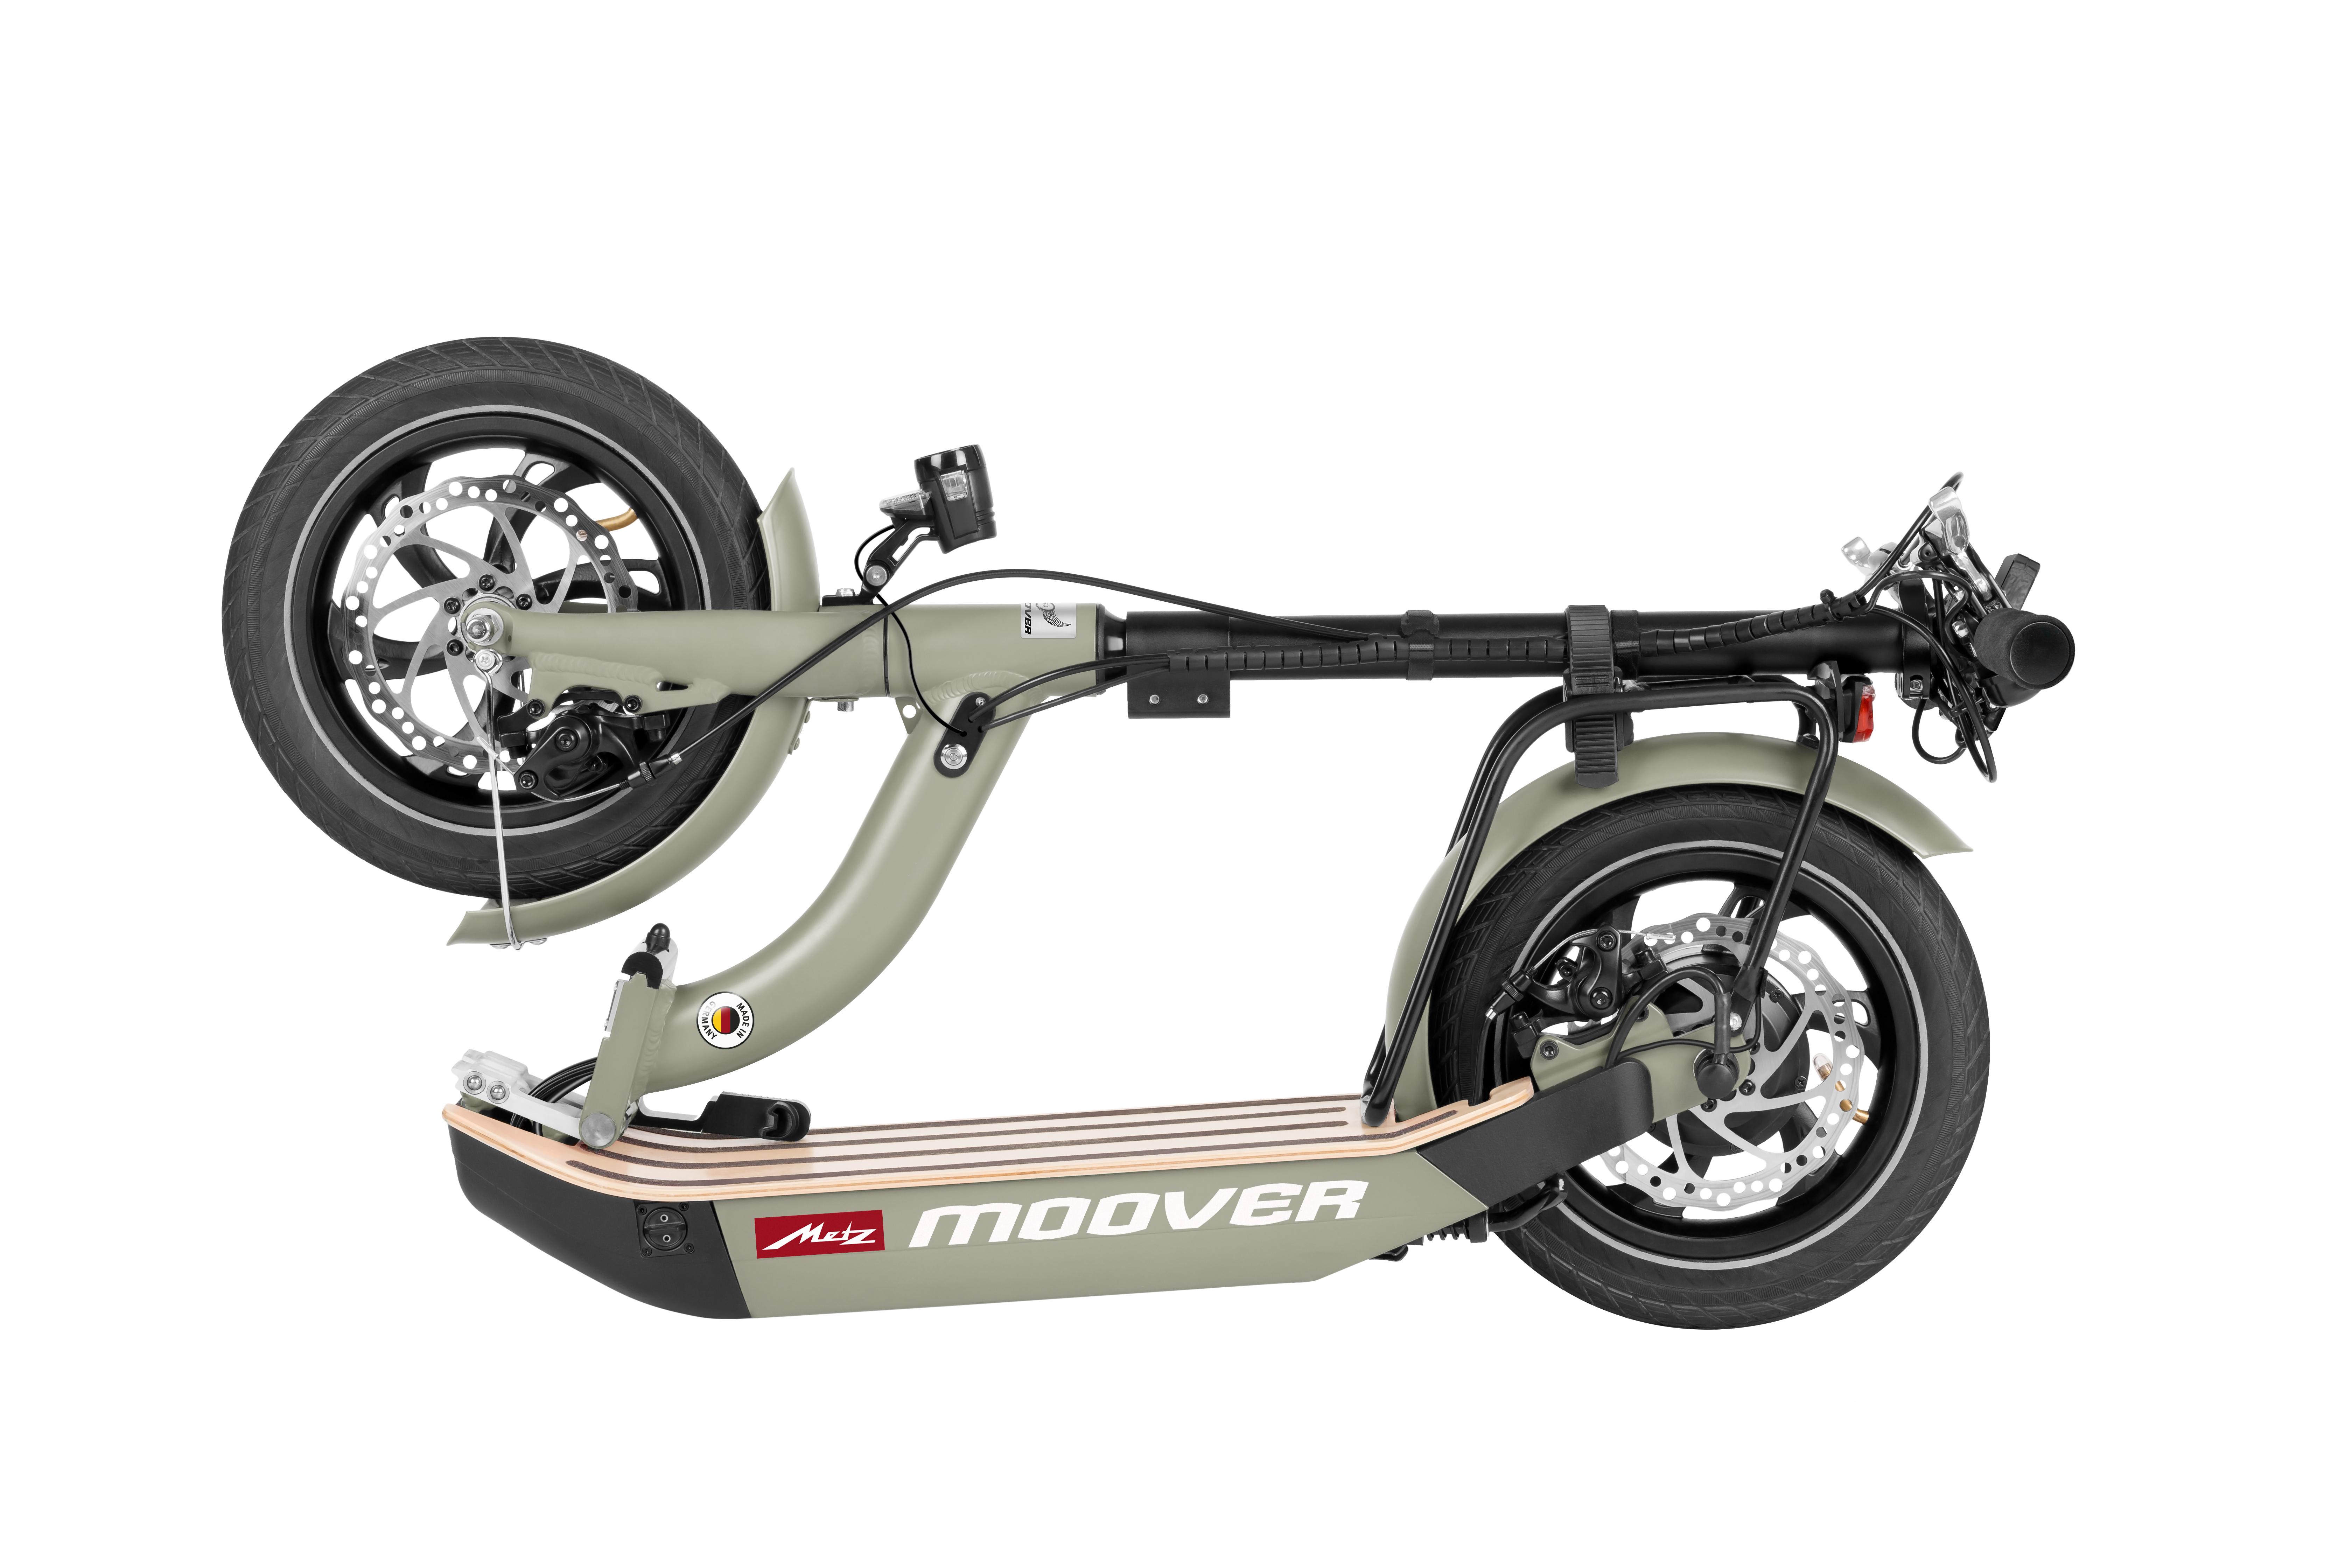 E-Scooter Metz Moover mit Zulassung